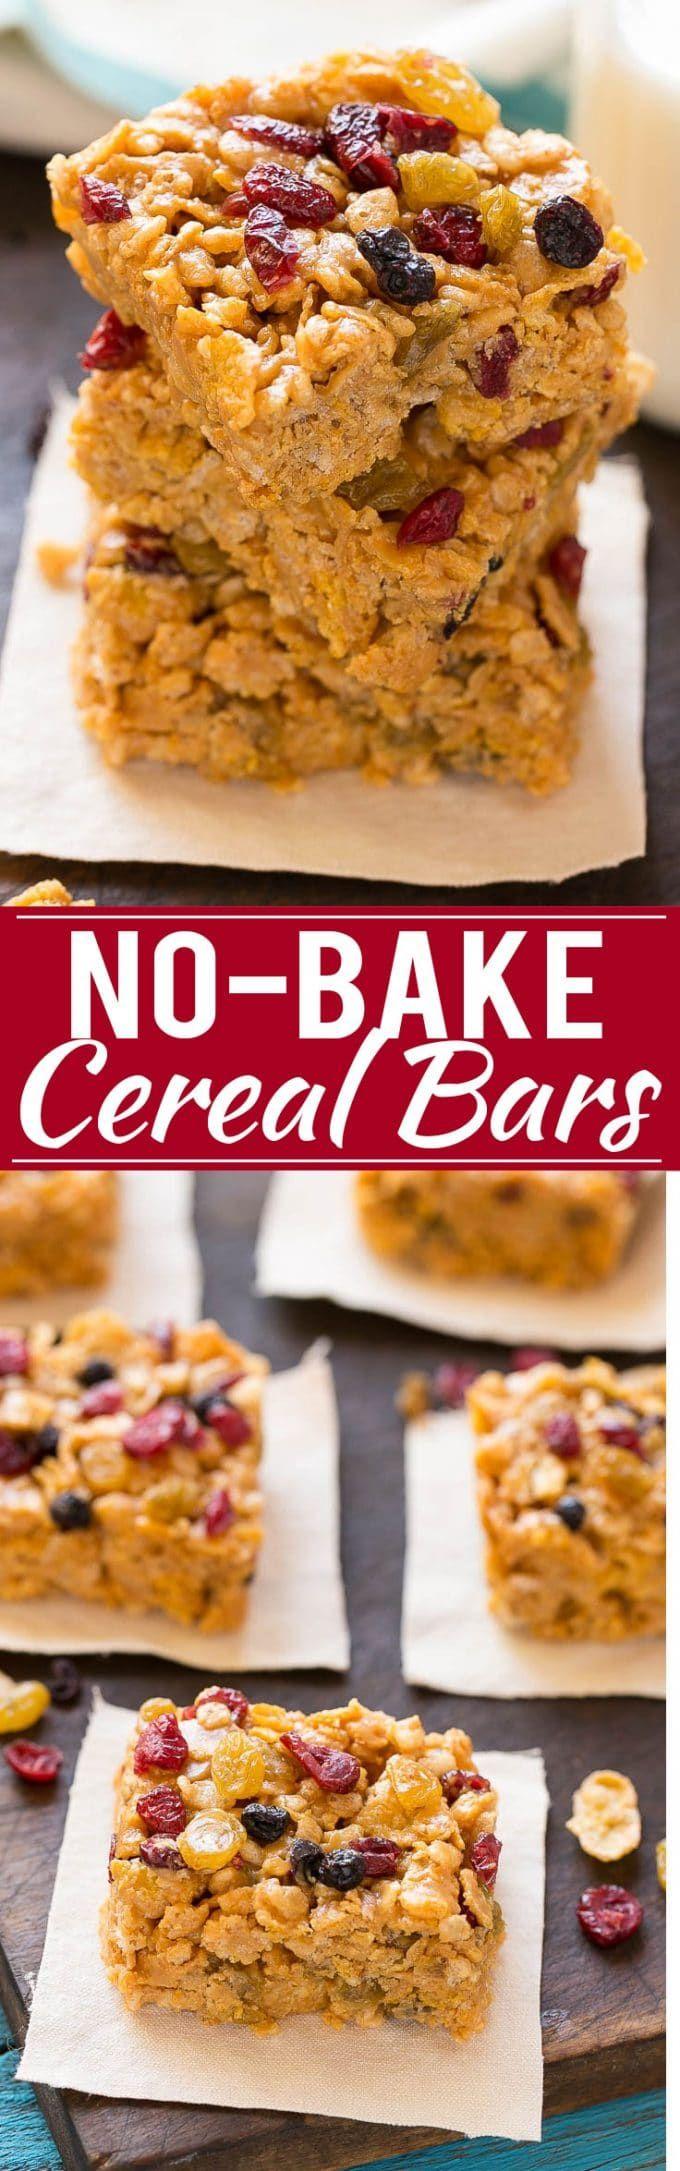 No-Bake Breakfast Cereal Bar Recipe | No-Bake Cereal Bars | Easy Cereal Bars | Best No-Bake Cereal Bars | Easy Cereal Bar | Easy No-Bake Cereal Bar | Breakfast Bar